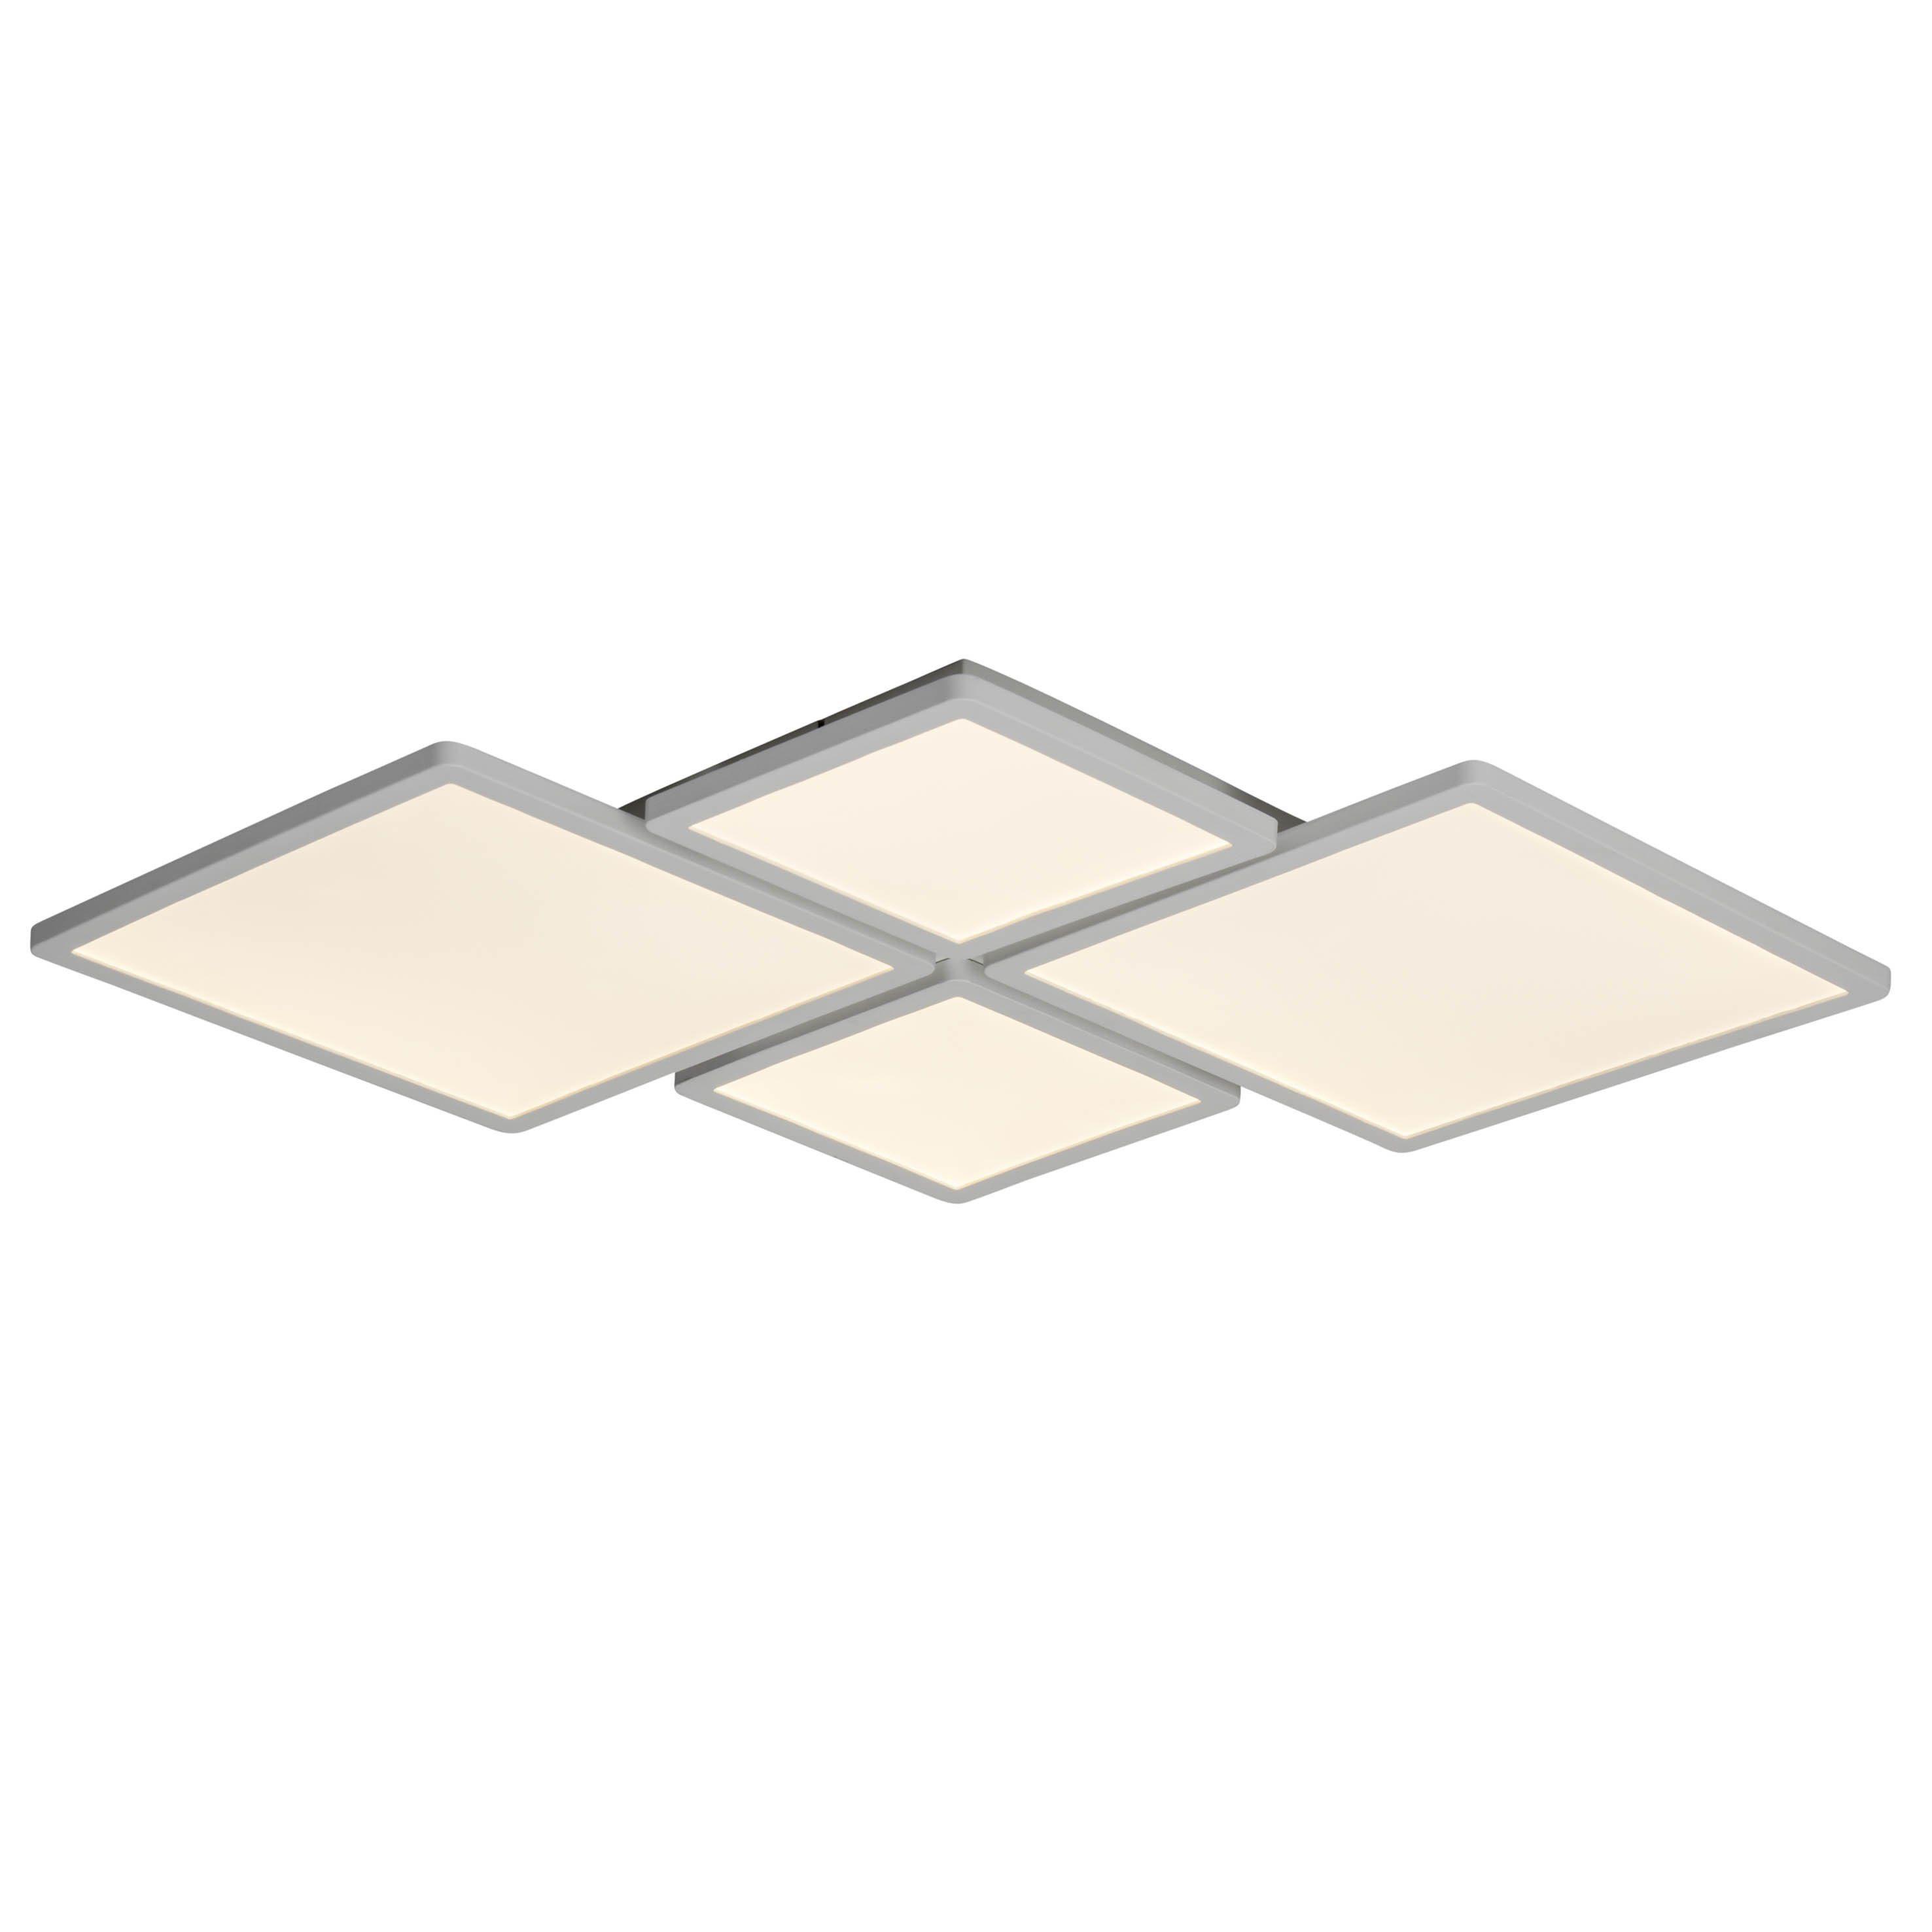 Brilliant Leuchten Scope LED Deckenaufbau-Paneel 61x61cm weiß matt easyDim